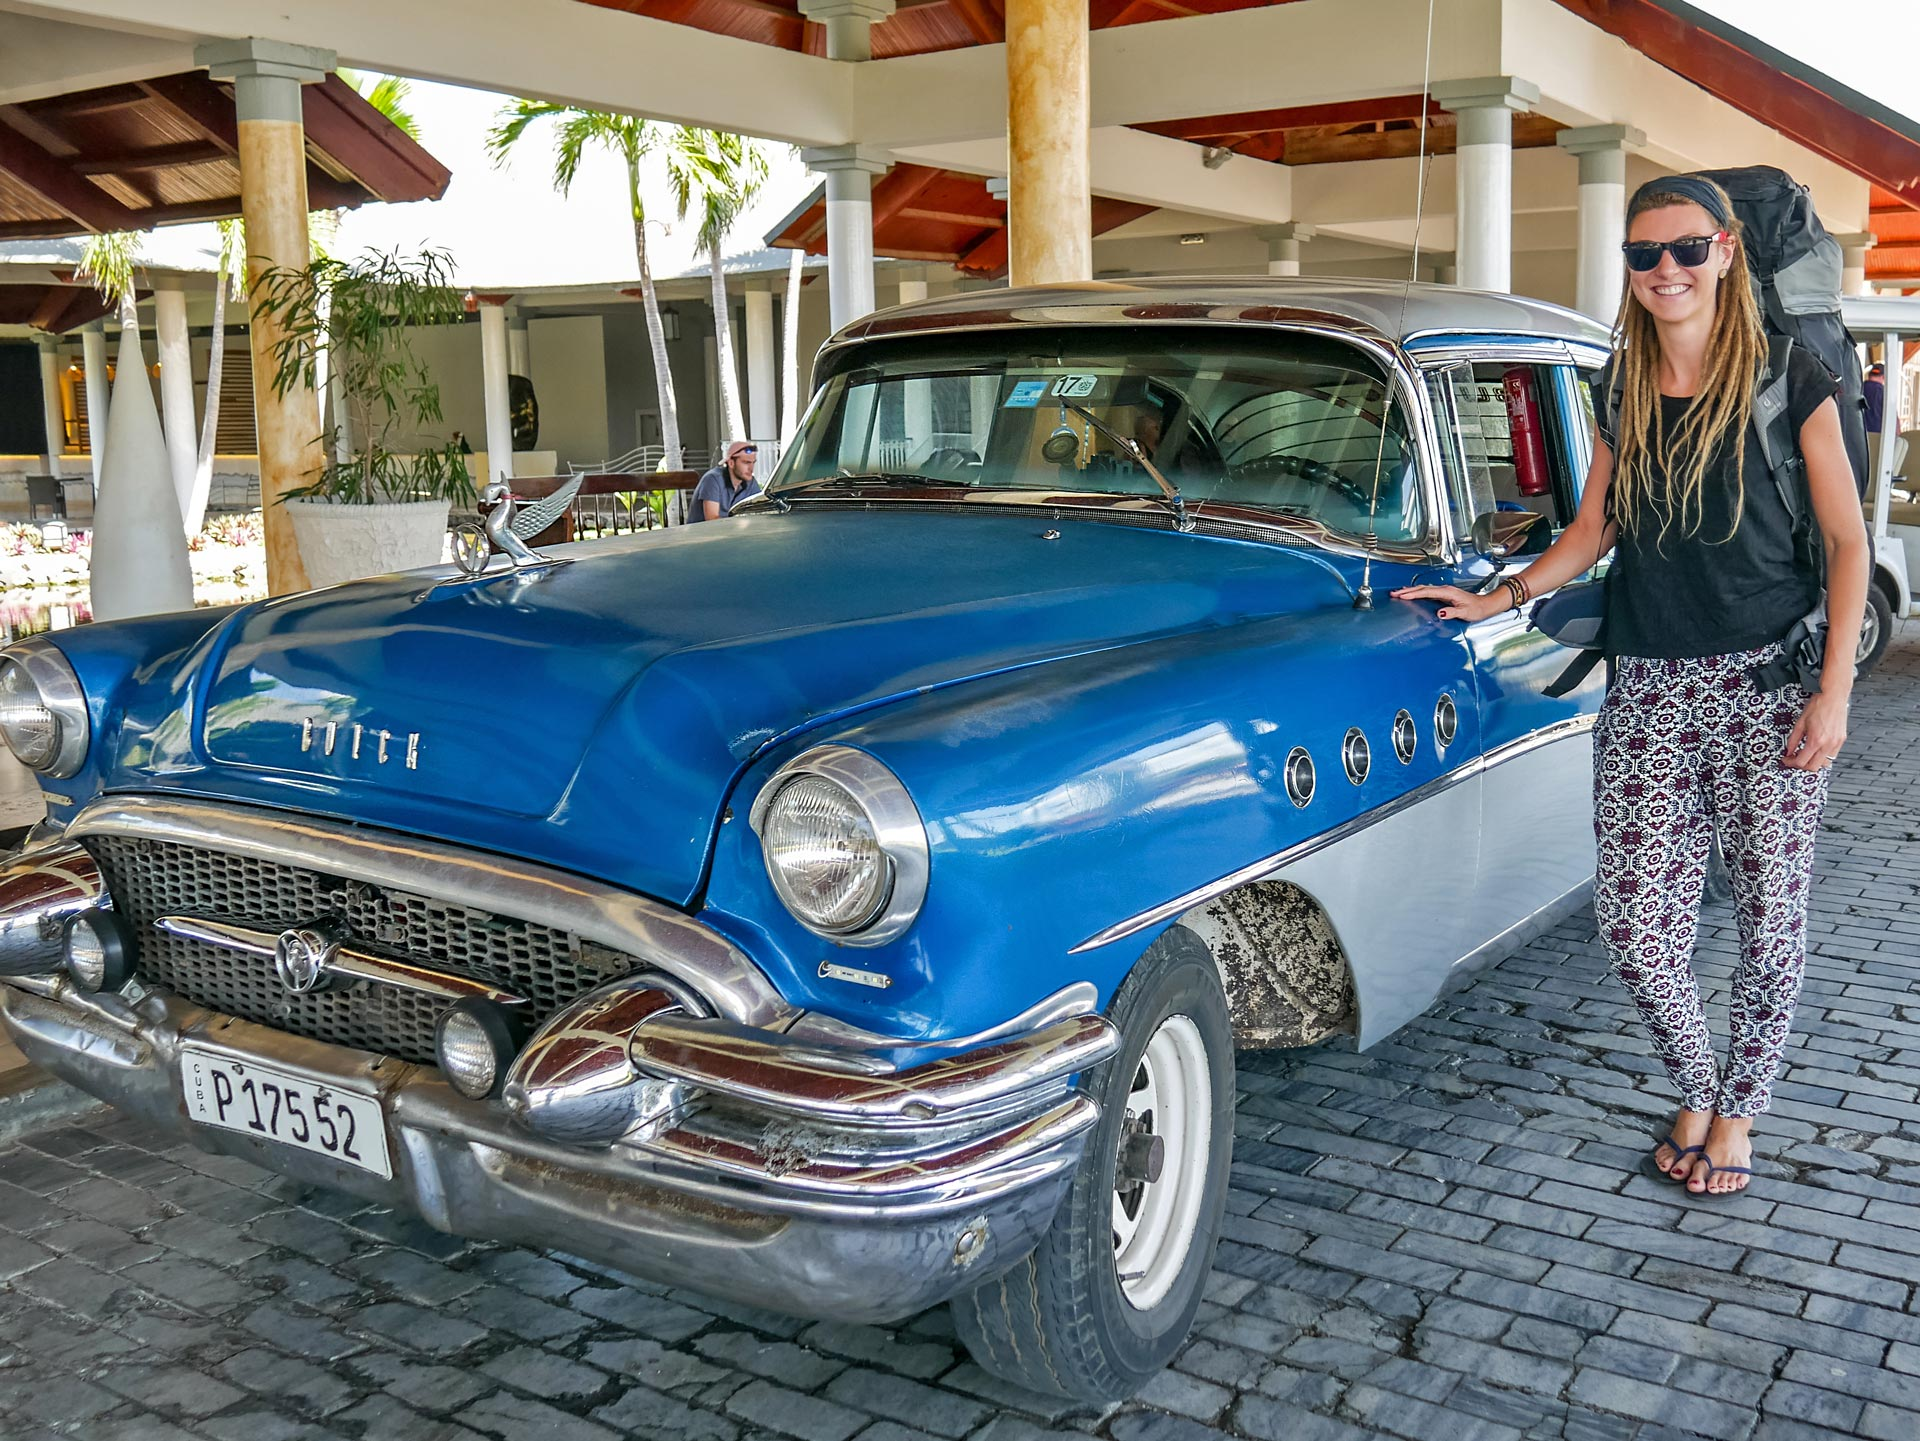 Dreadlock girl in hotel next to classic Buick car in Varadero, Cuba